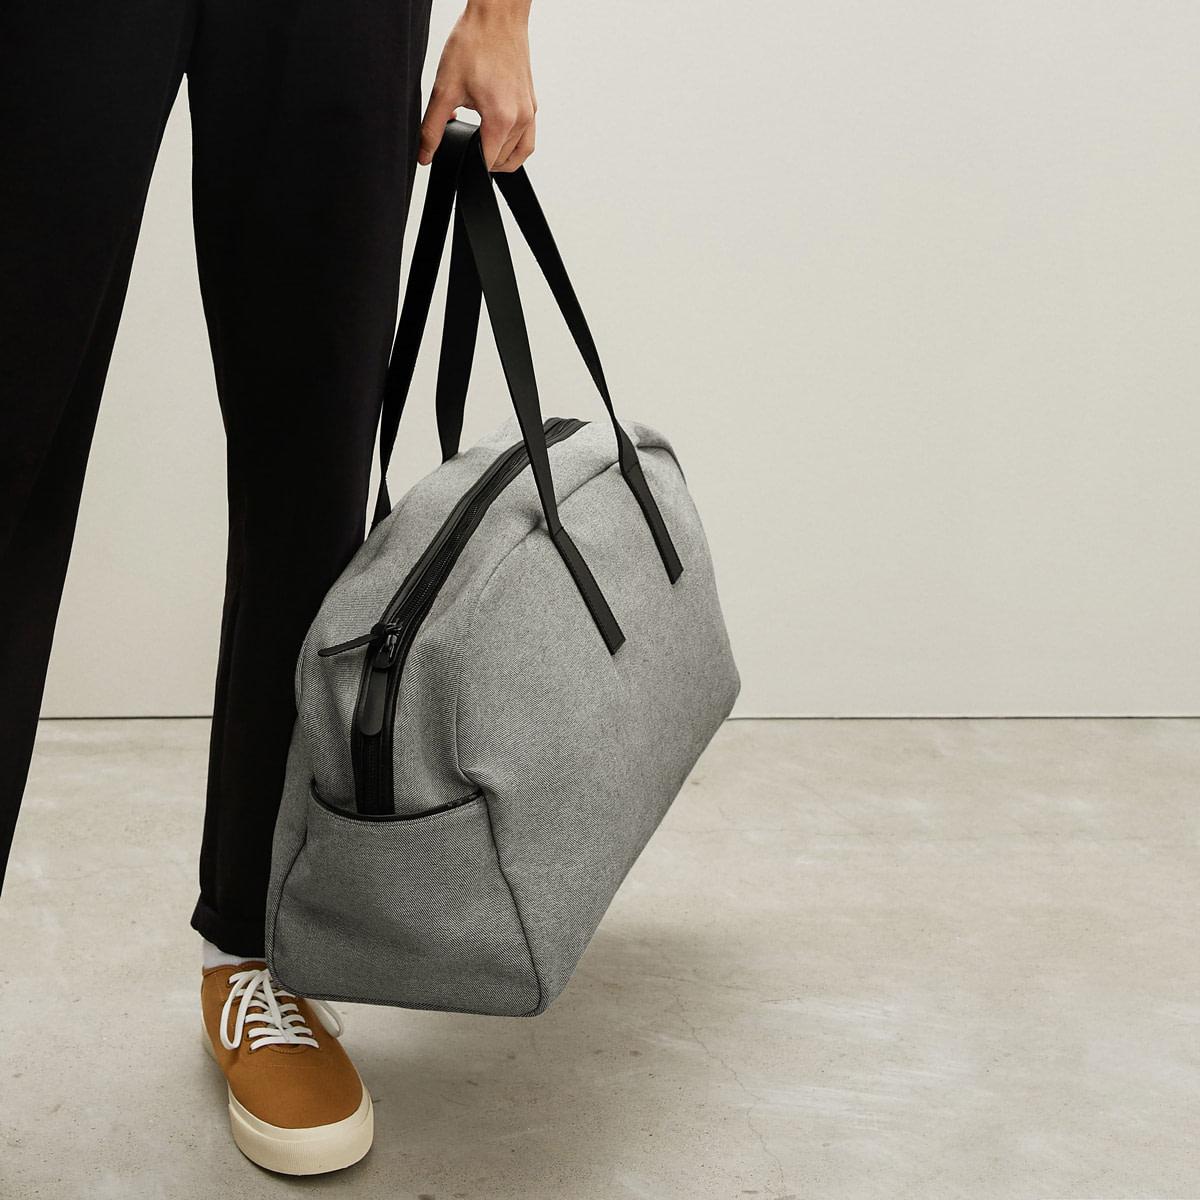 Best affordable duffel bag